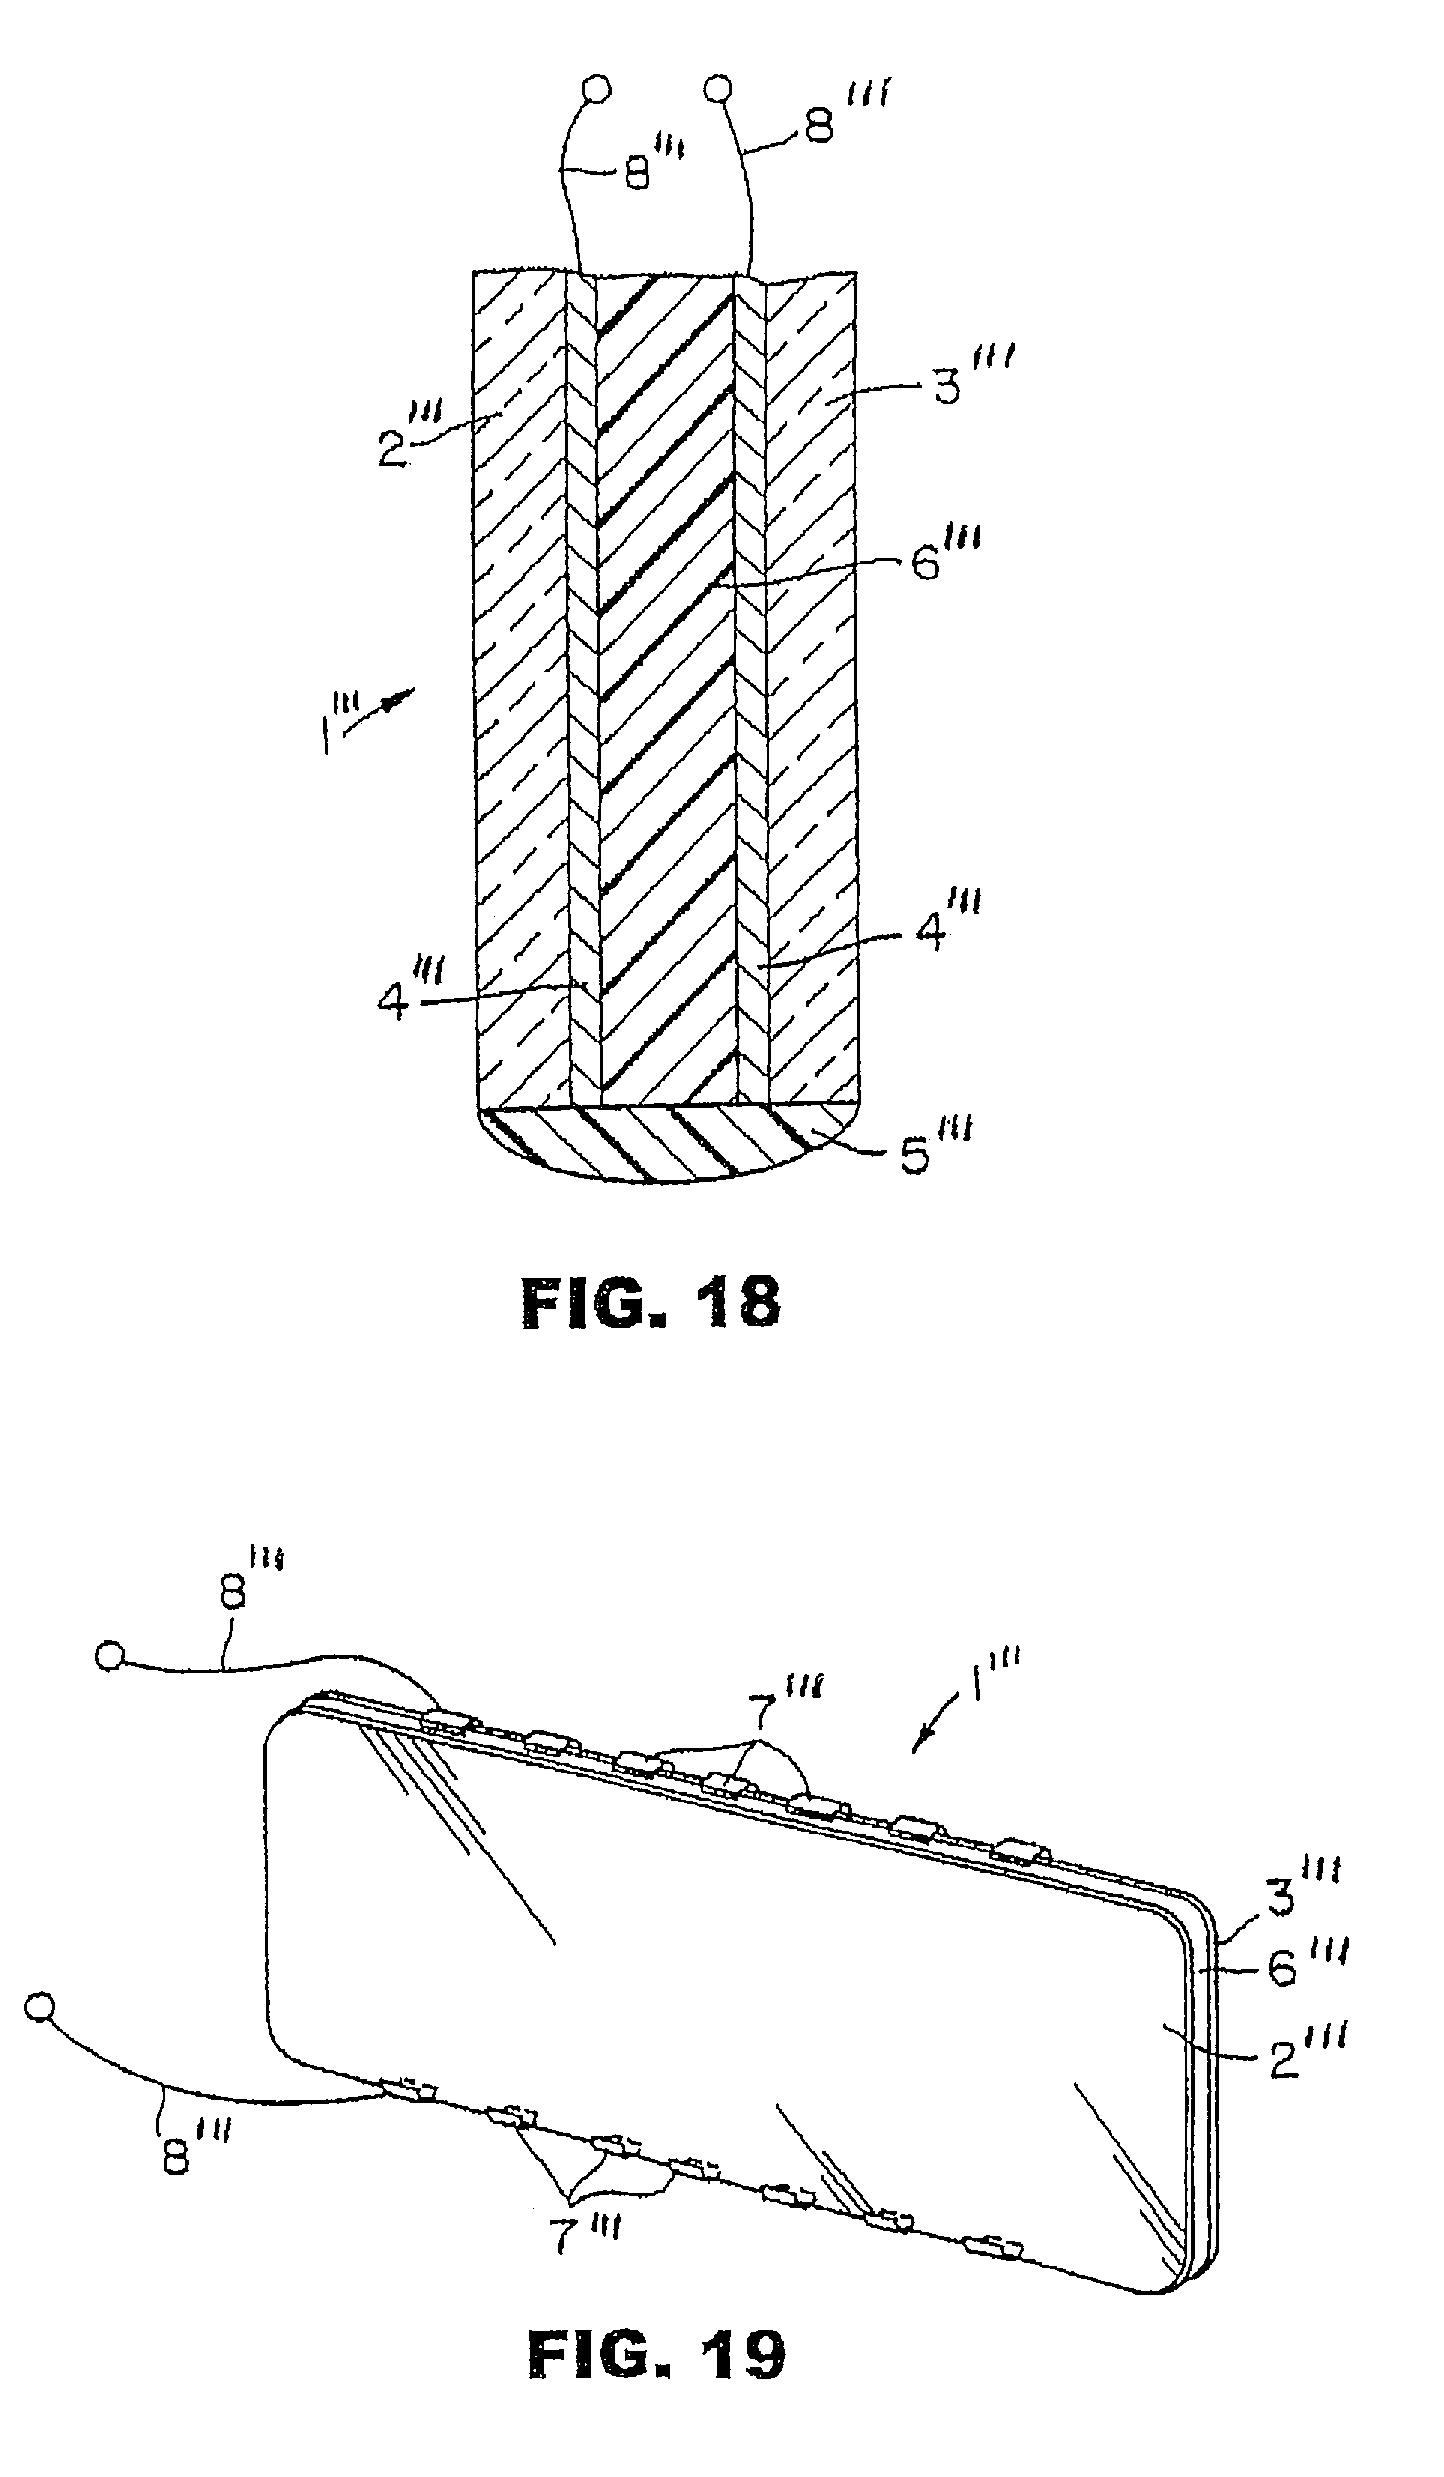 Patent US 8,511,841 B2